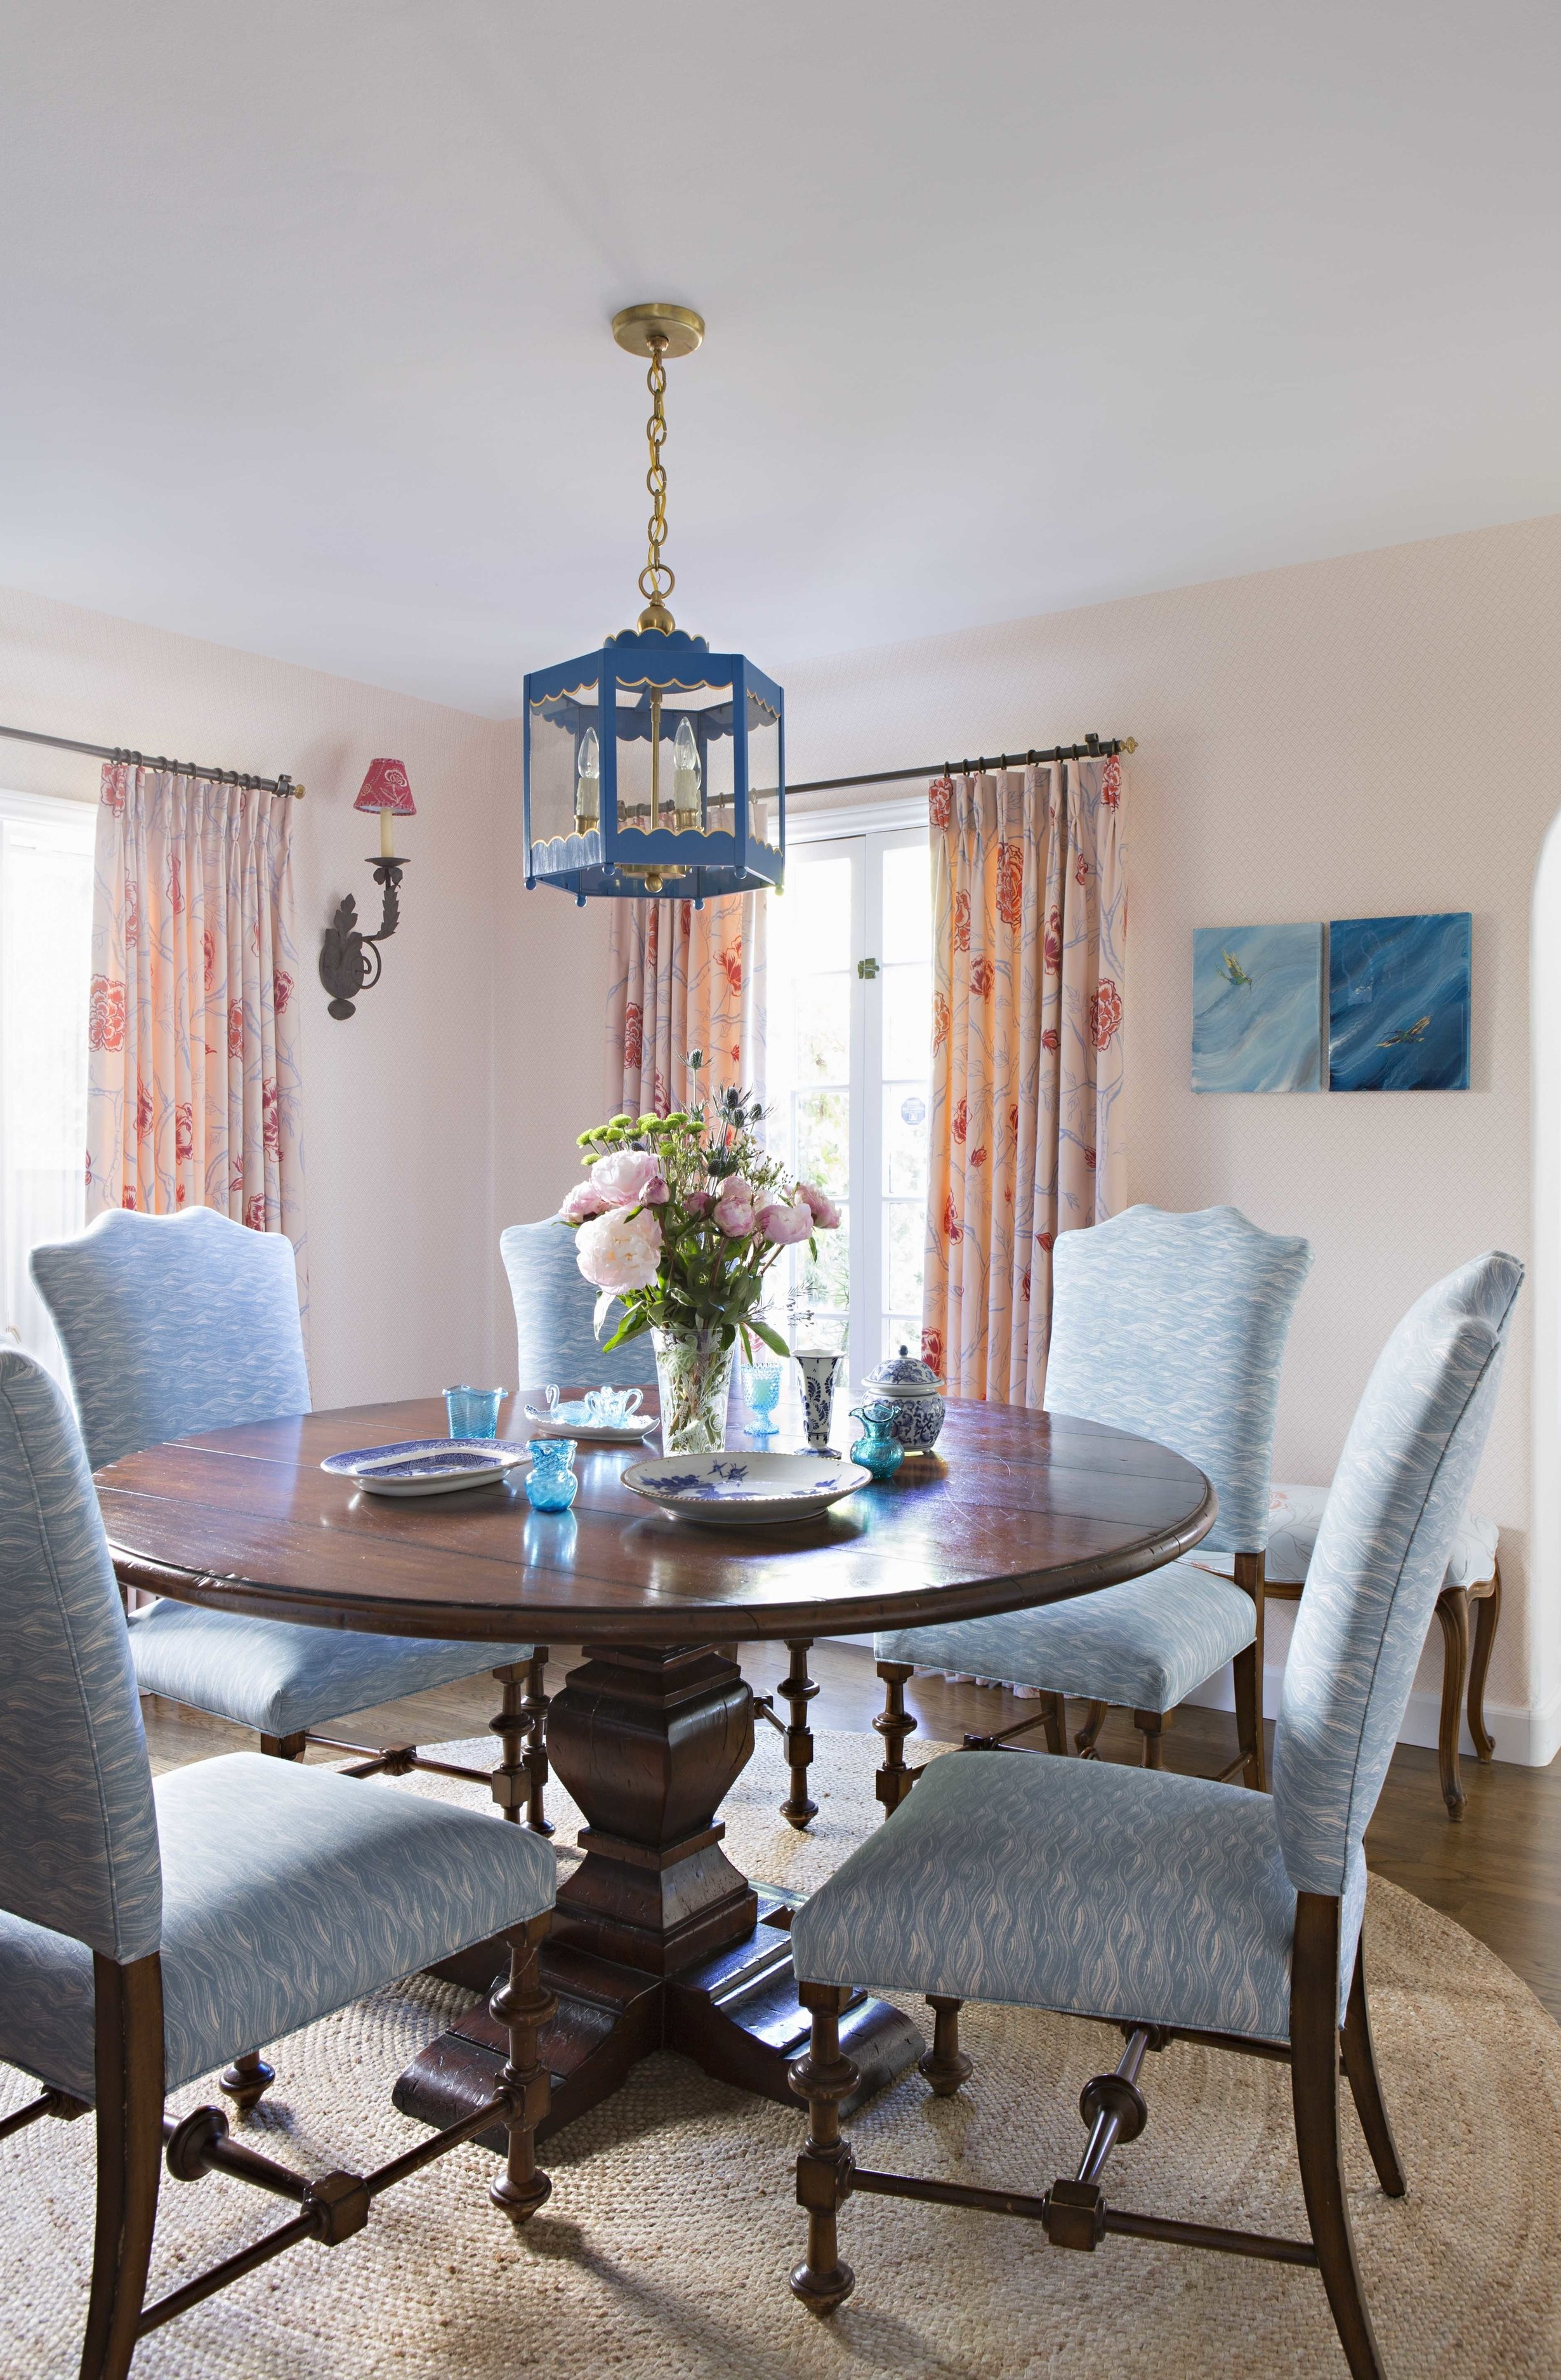 Basketweave Wallpaper in Blush, Interiors by Sharon Lee, Photo by Karyn Millet